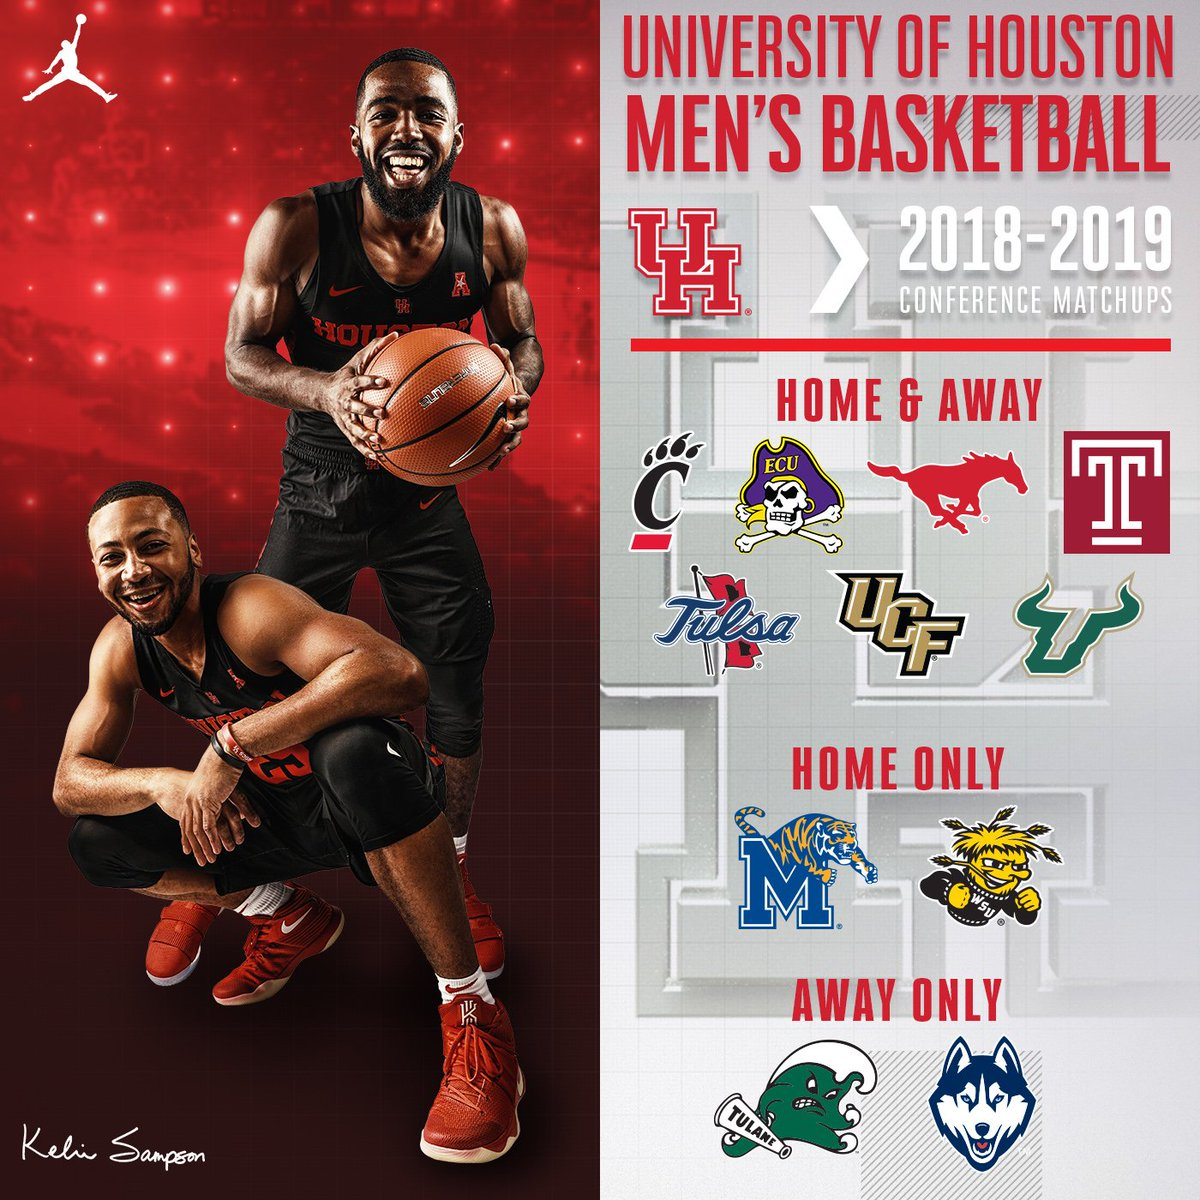 f29ff7be007 Houston Men's Hoops 🏀 🐾 on Twitter: